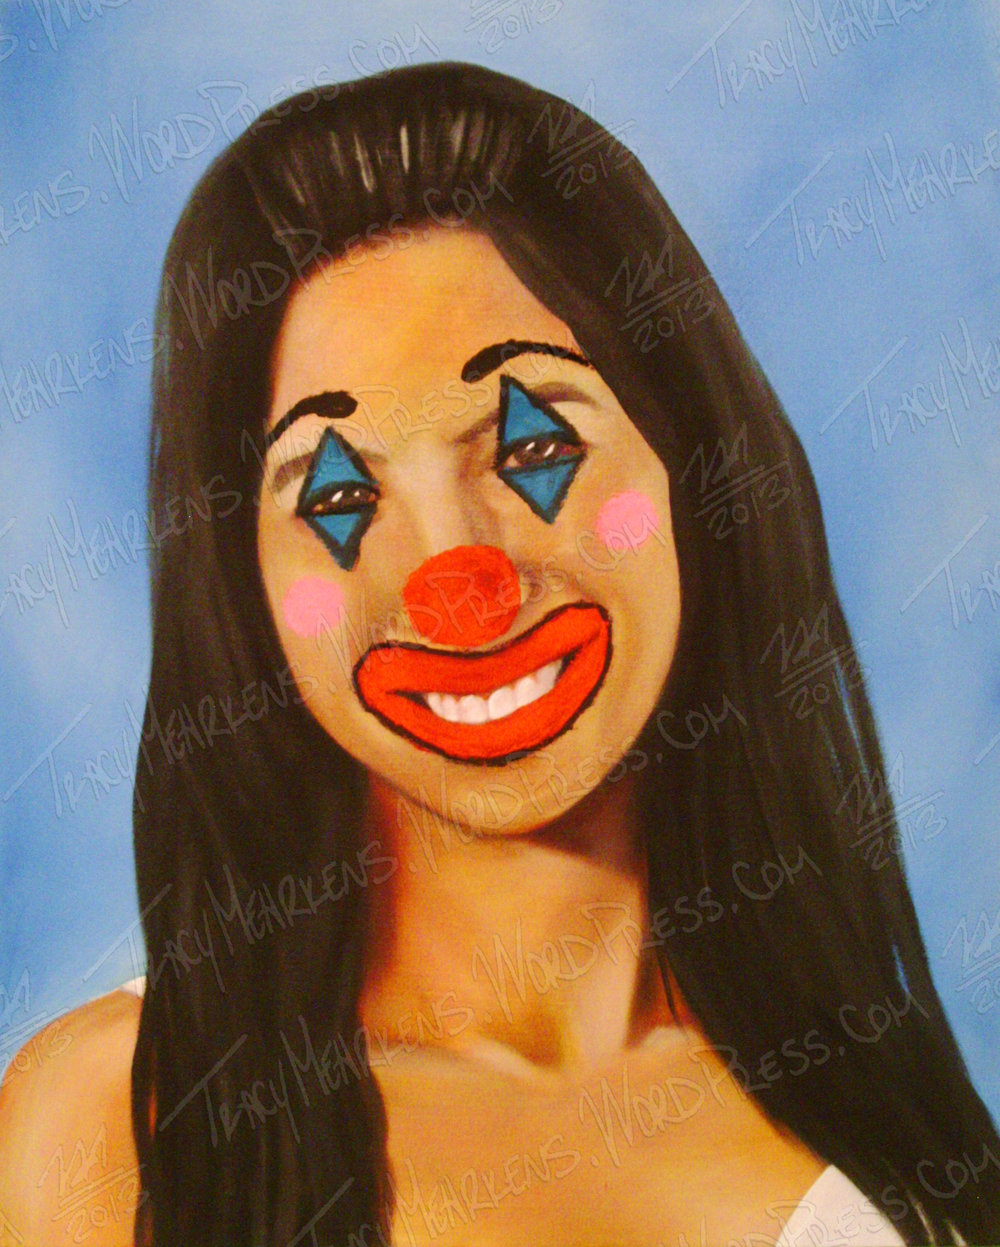 Roomie The Clown. Acrylic on Canvas. 20x28 in. 2013.